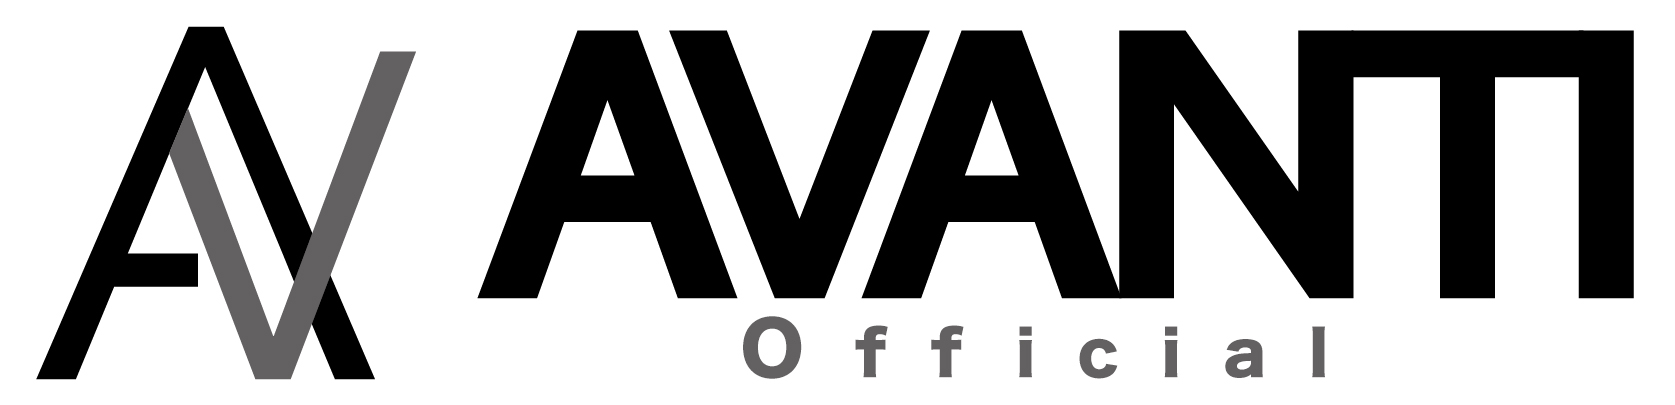 AVANTI Official